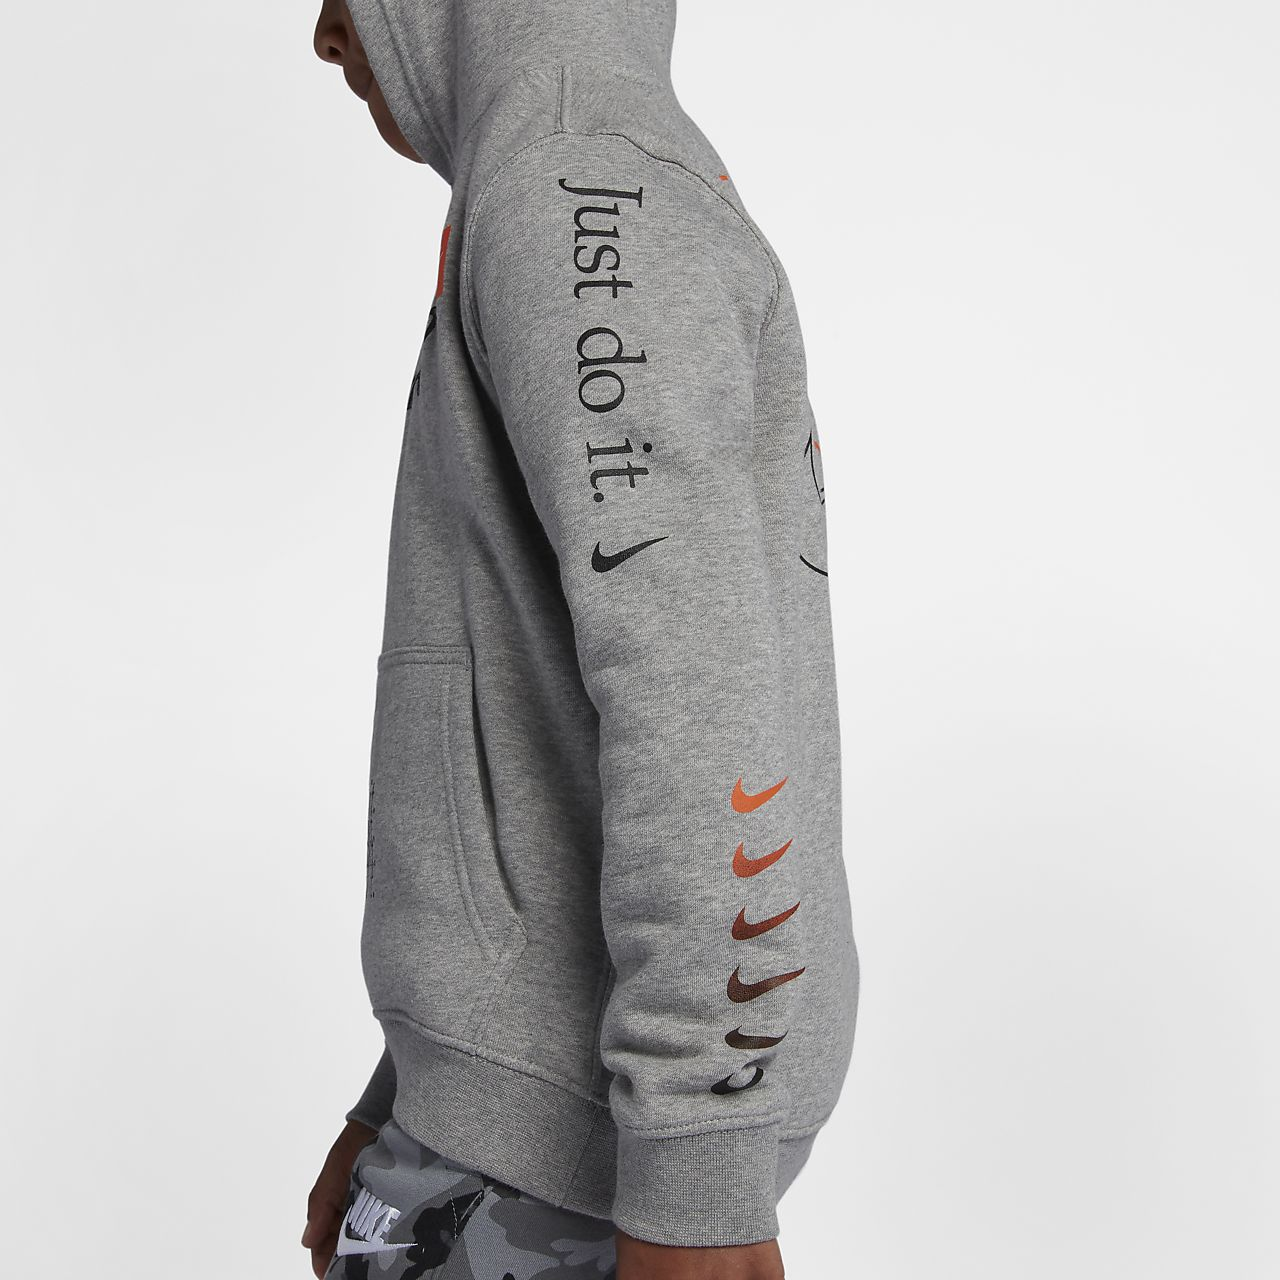 1dd5c2c2990f Nike Sportswear Big Kids  (Boys ) Just Do It Pullover Hoodie. Nike.com